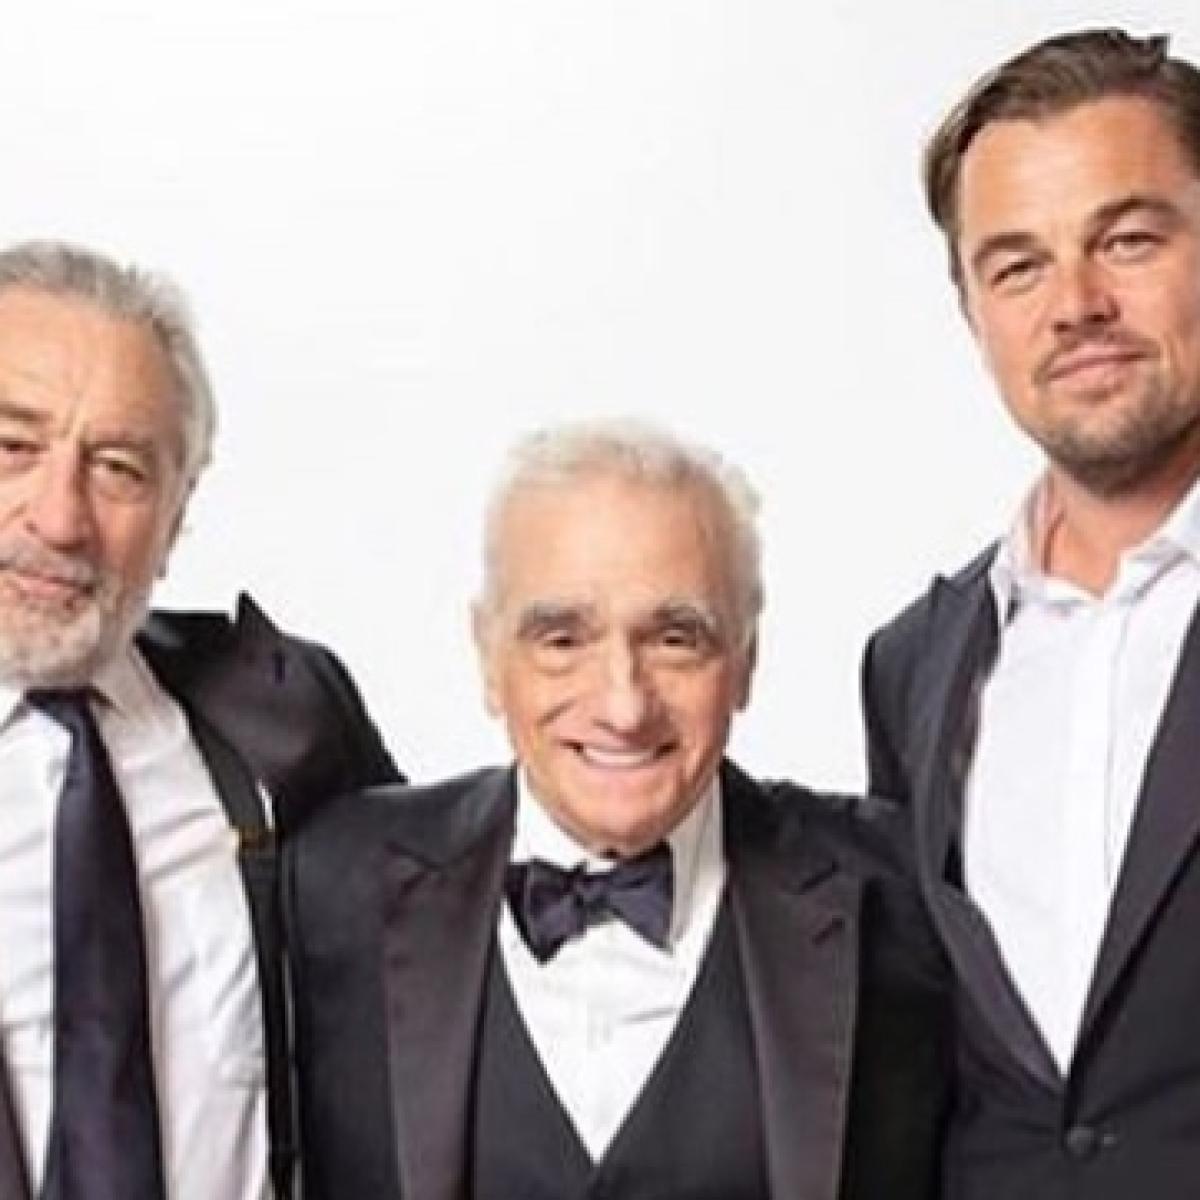 Leonardo DiCaprio, Robert De Niro offer Martin Scorsese movie role to raise money for food fund